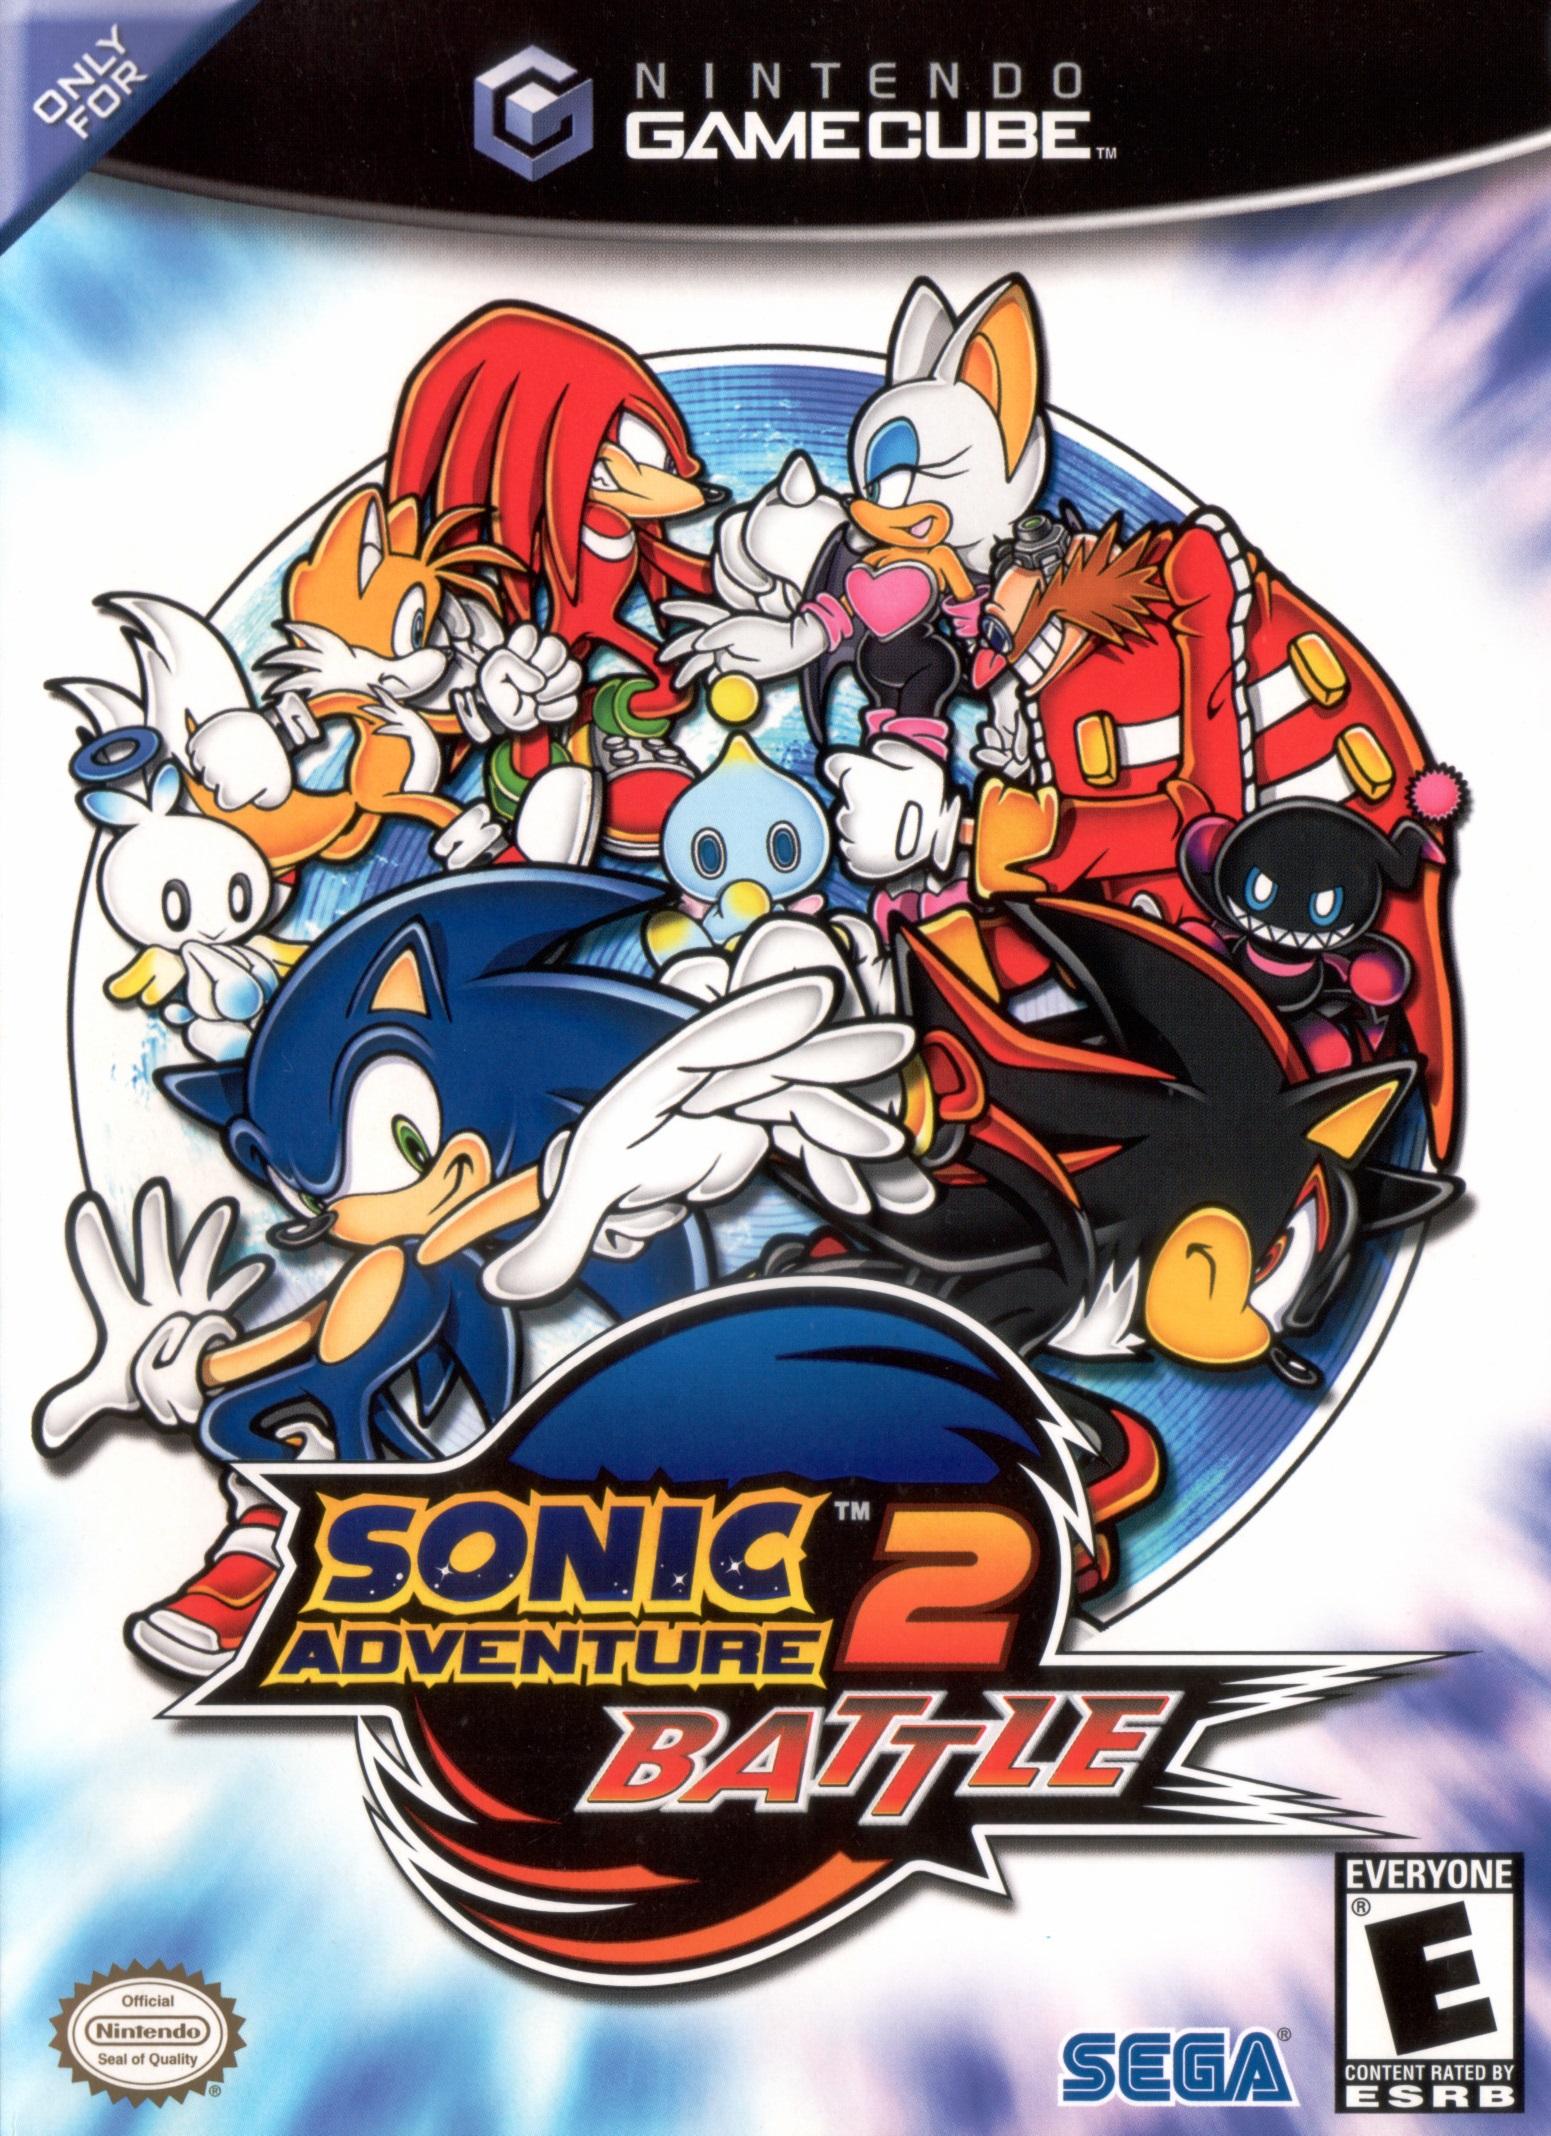 GSNP8P - Sonic Adventure 2: Battle